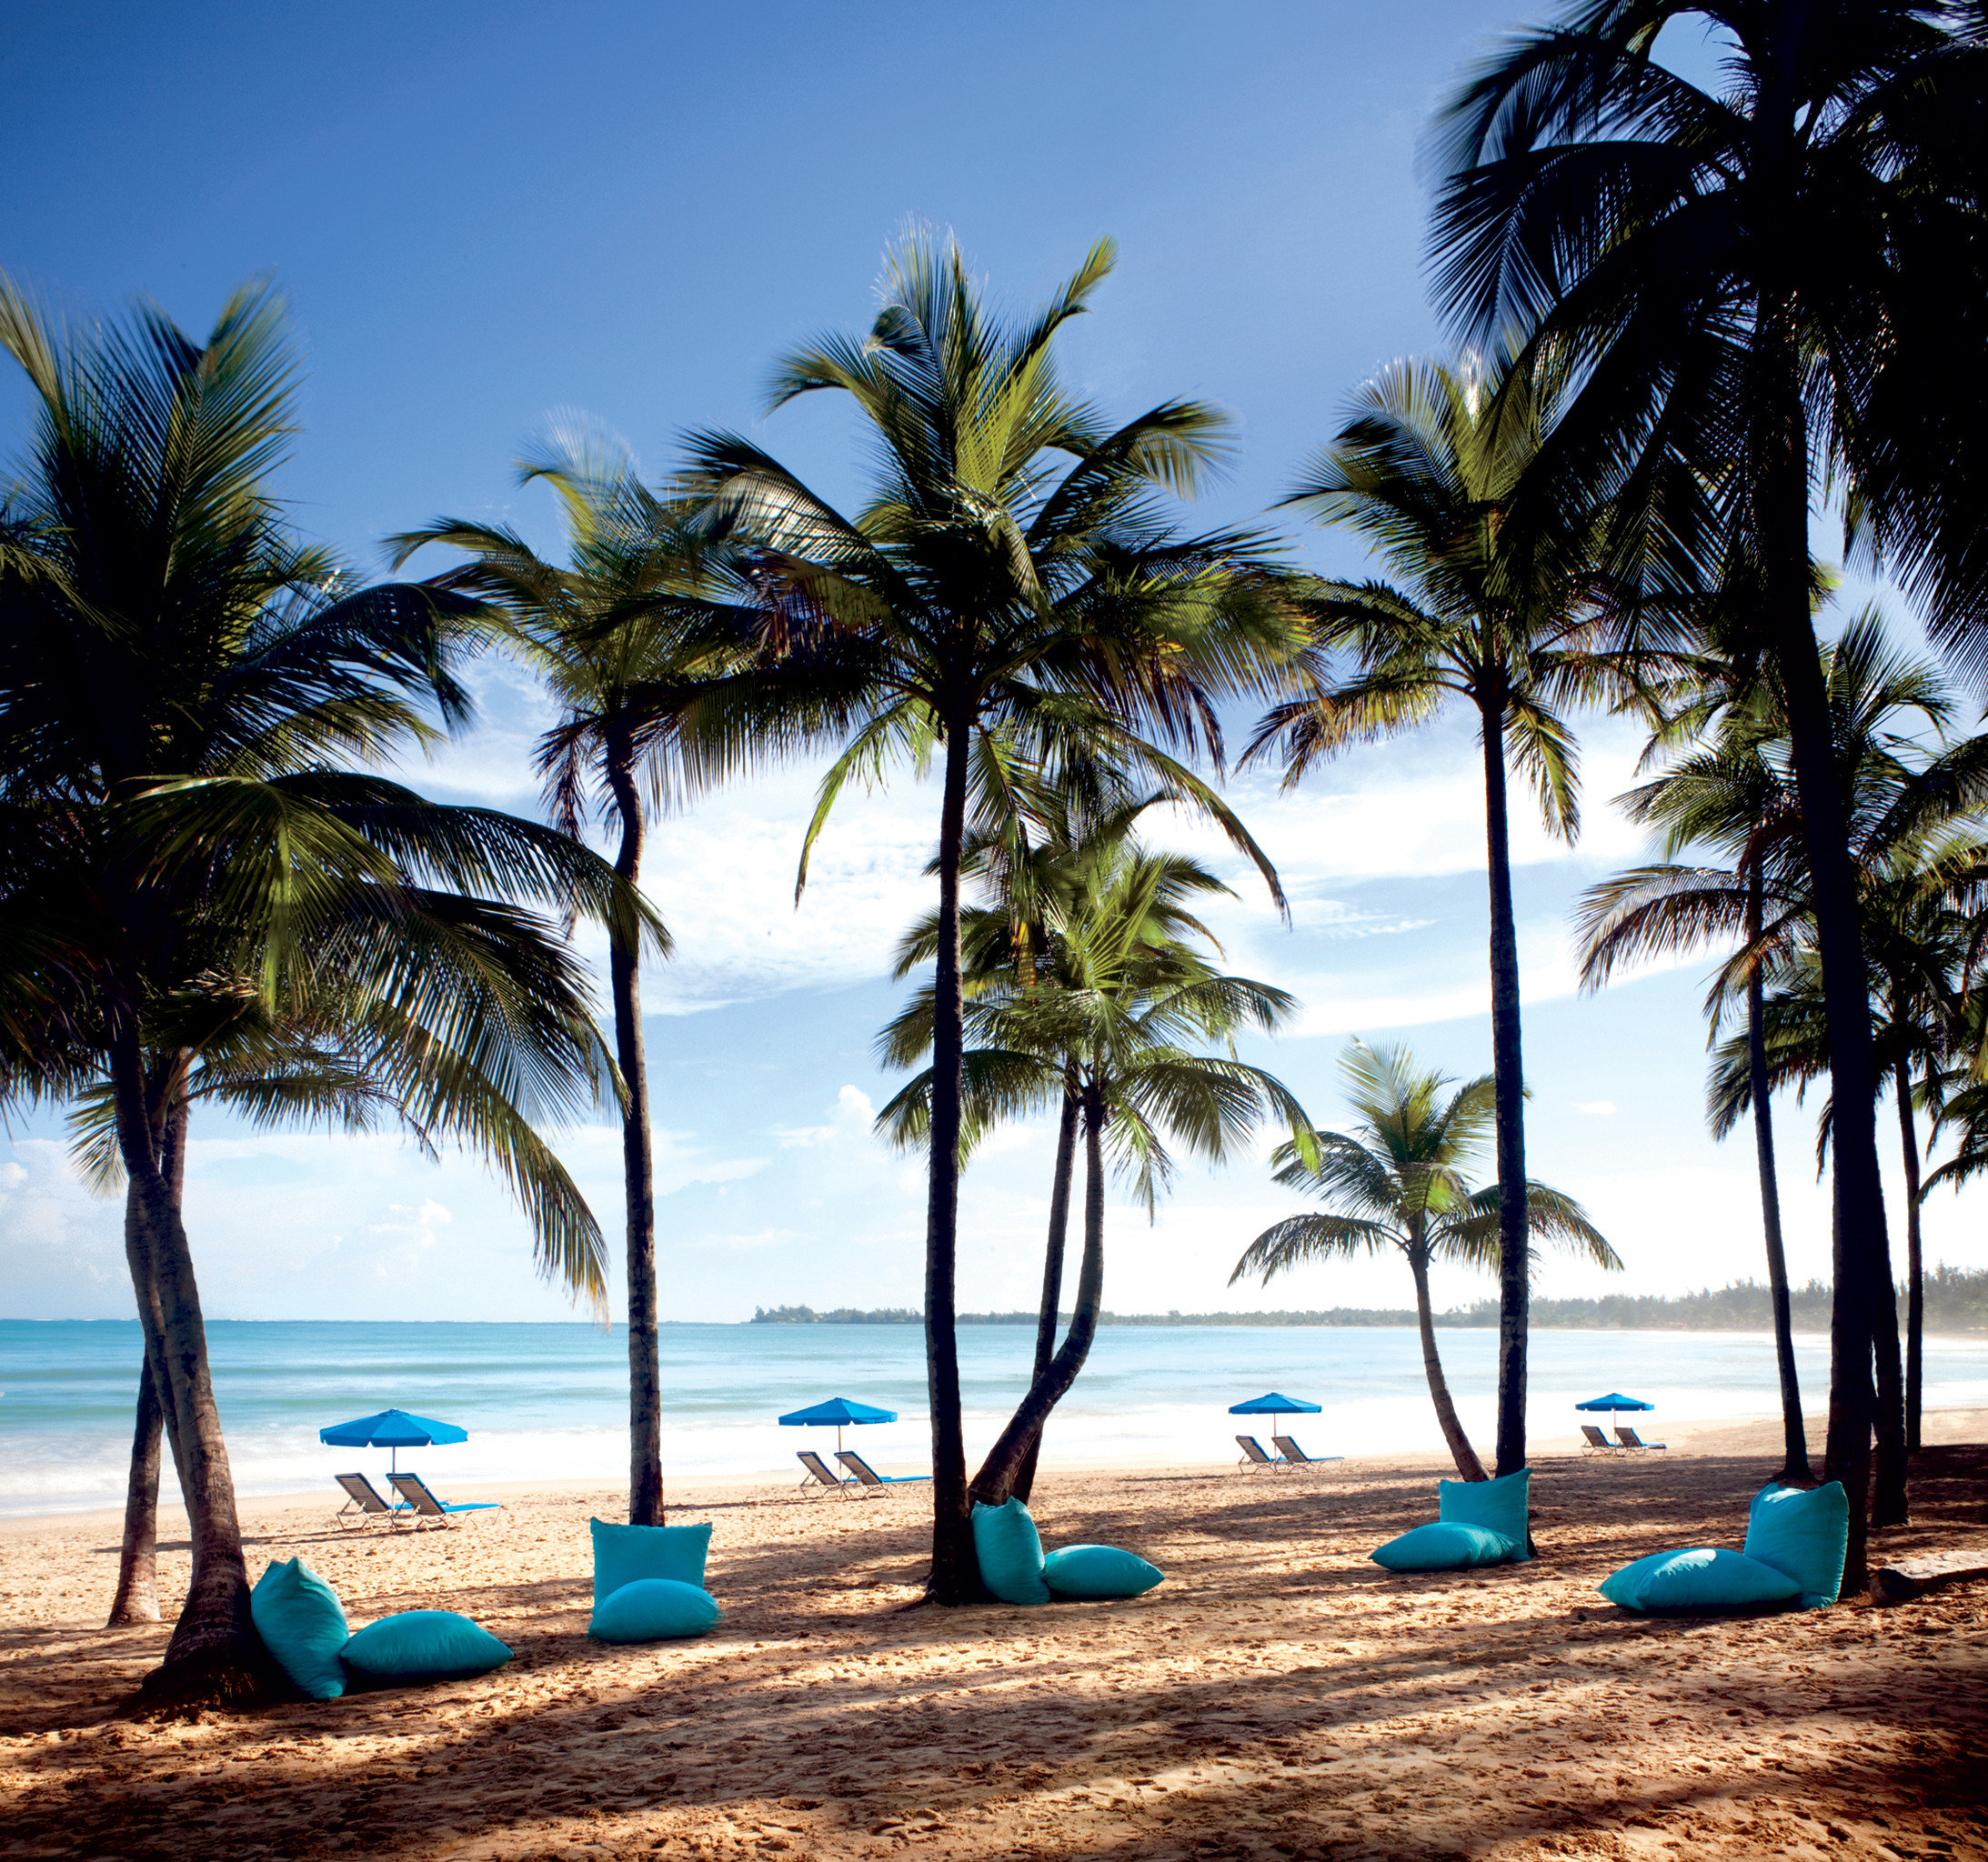 Beach Beachfront Jetsetter Guides Luxury Ocean Play Resort tree palm water sky Sea caribbean shore palm family tropics plant Coast lined arecales woody plant sandy Island Lagoon shade sand line